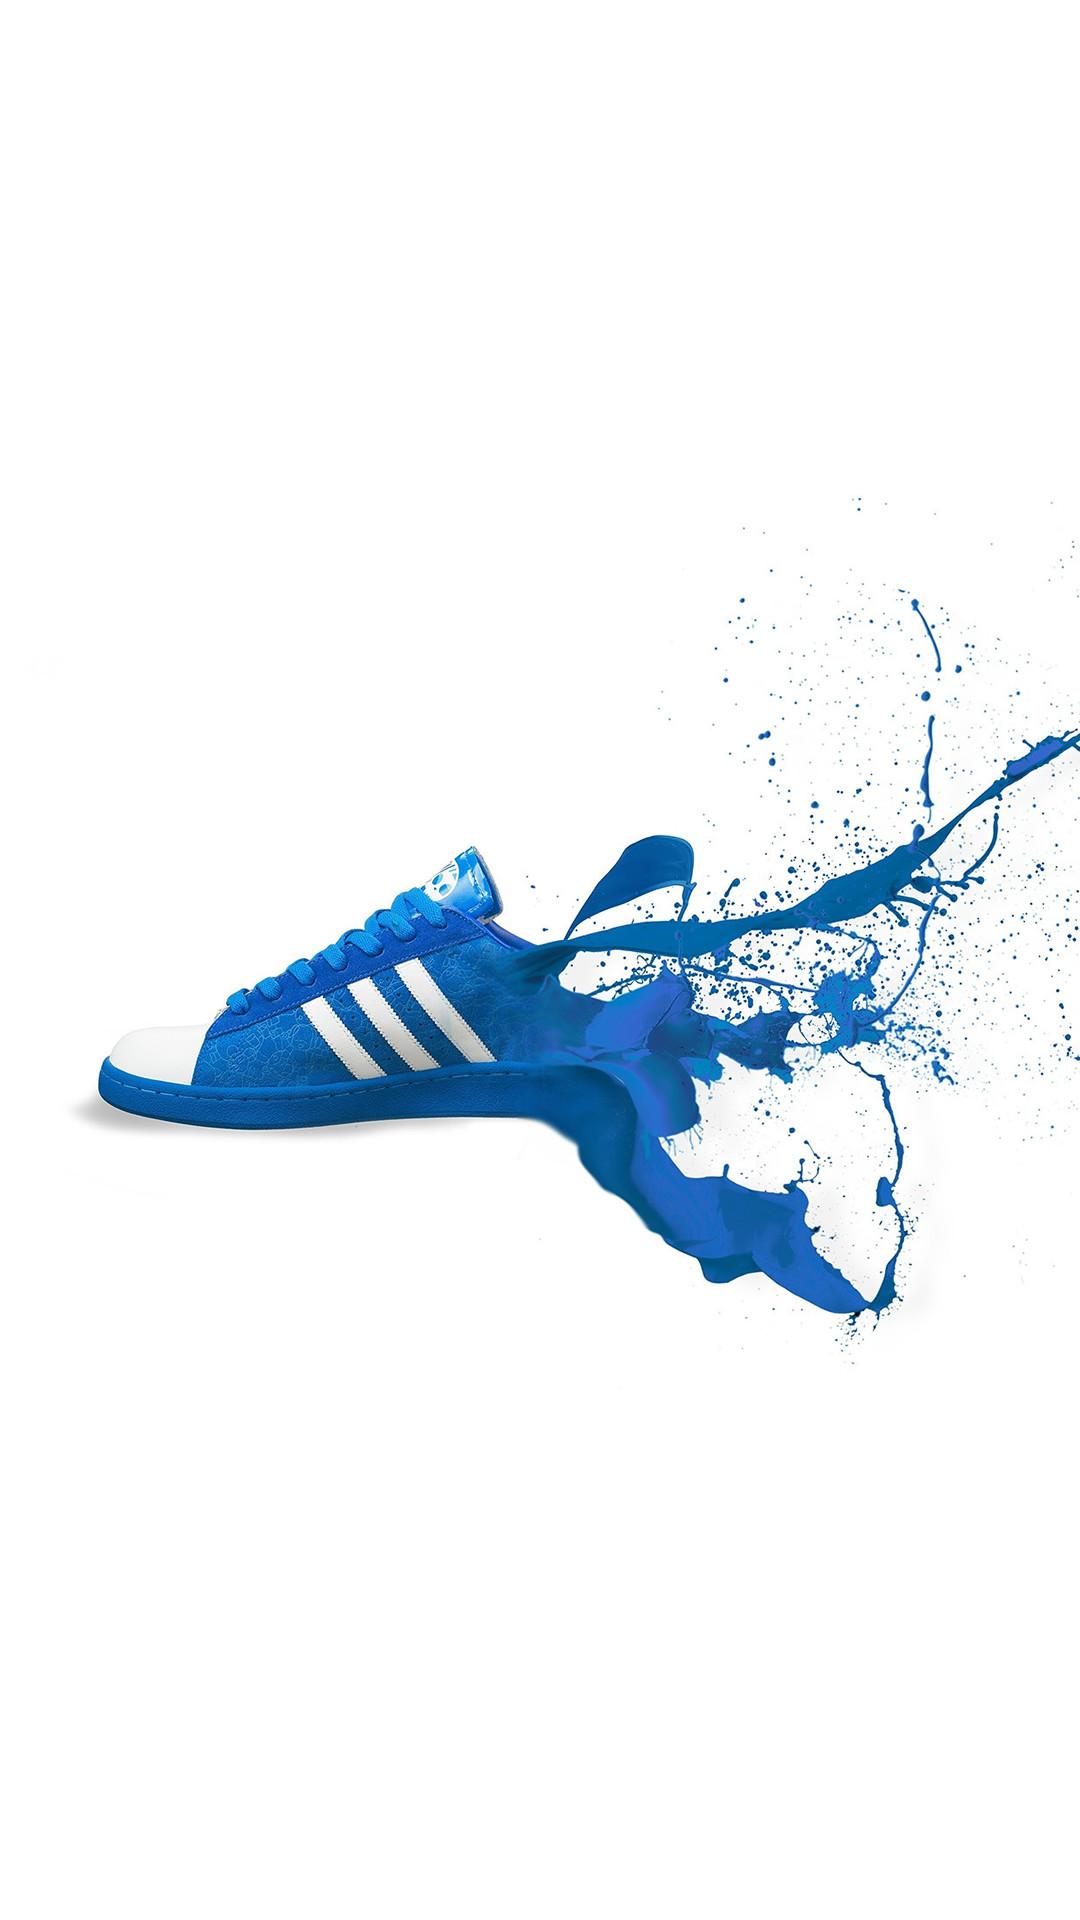 Adidas Blue Shoes Sneakers Logo Art #iPhone #6 #plus #wallpaper